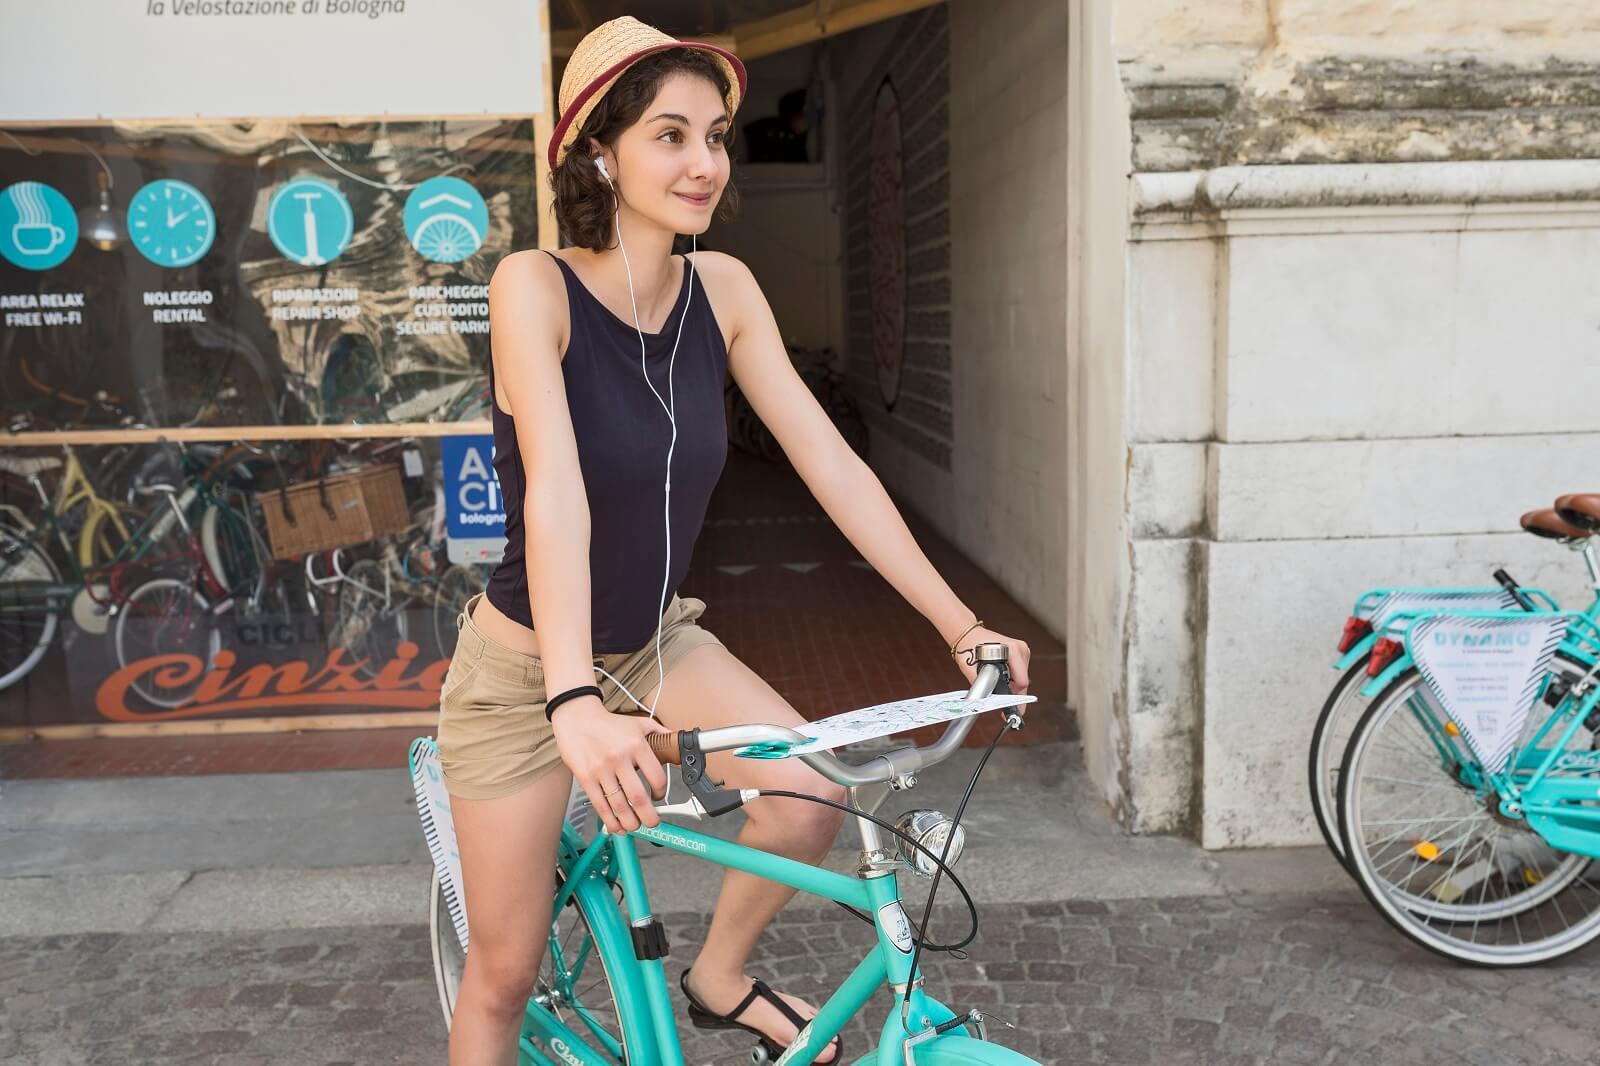 The Best of Bologna - Dansen tussen de fietsen